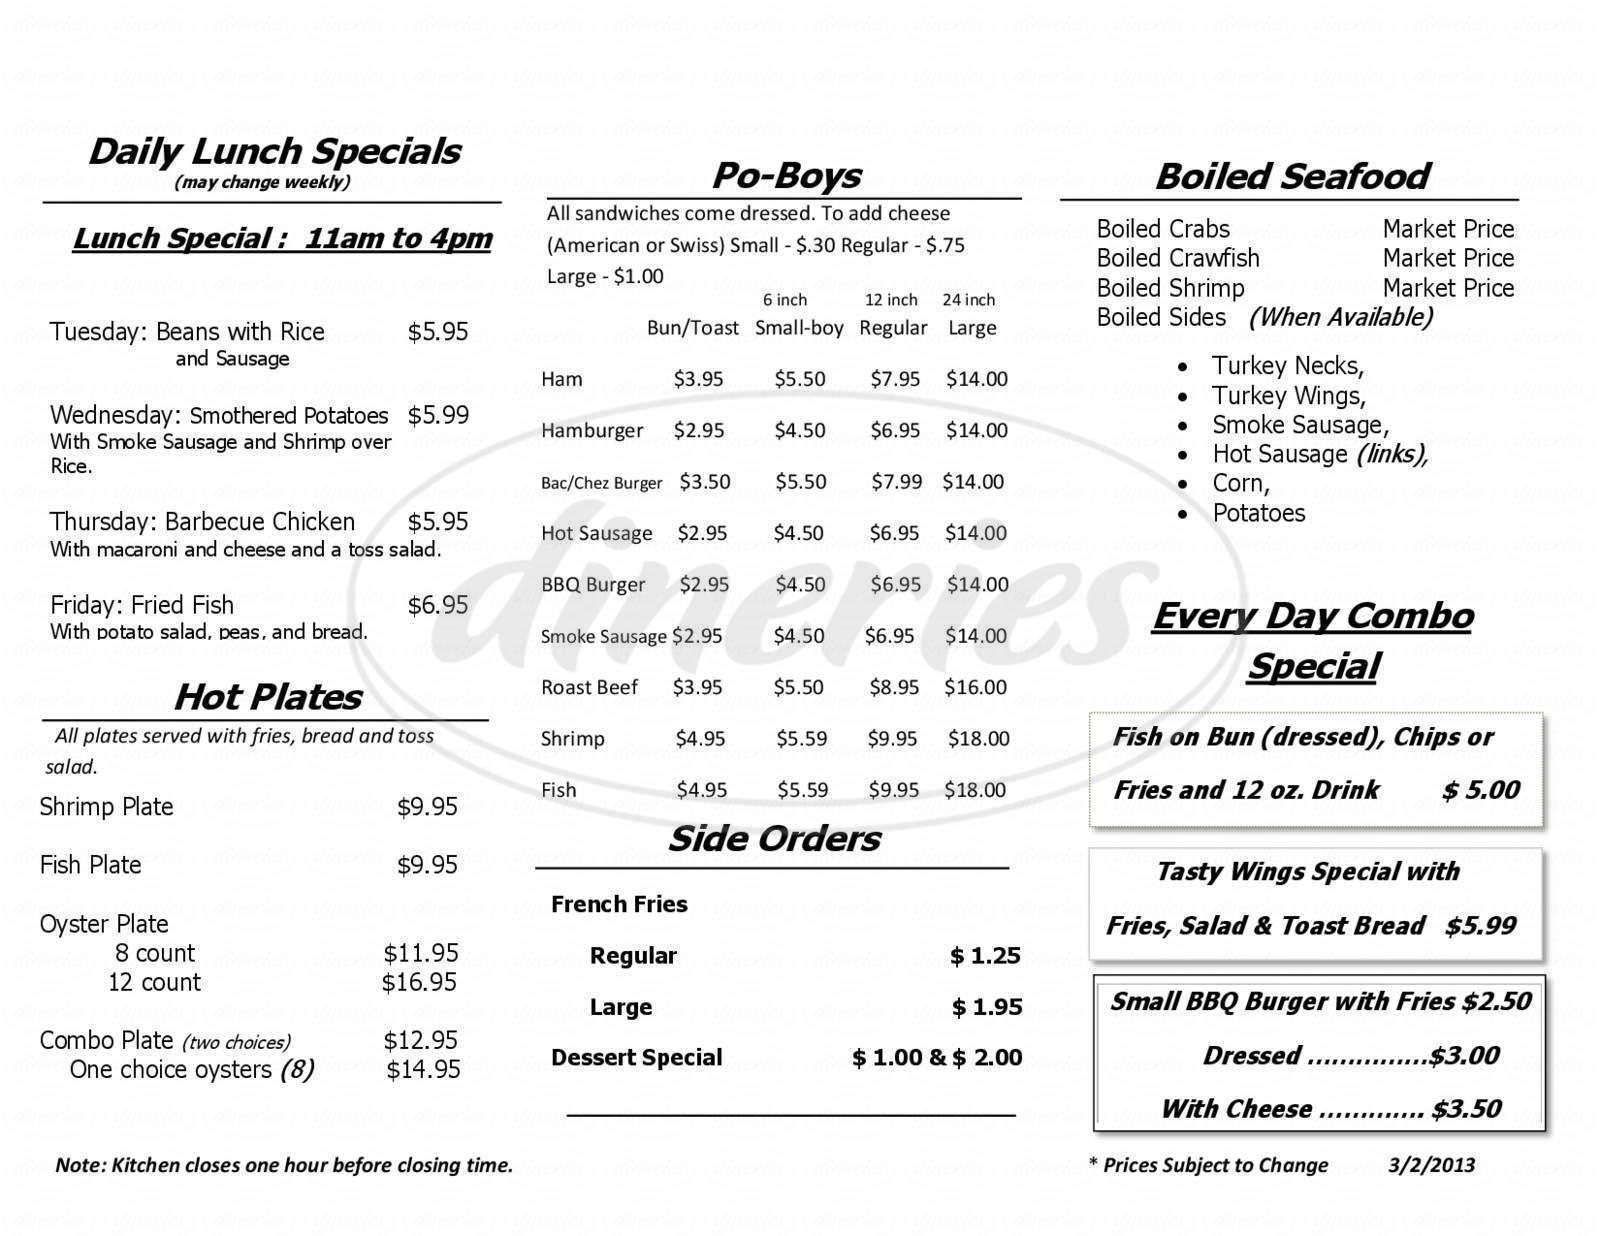 menu for Crump's Seafood Market & Sandwich Shop